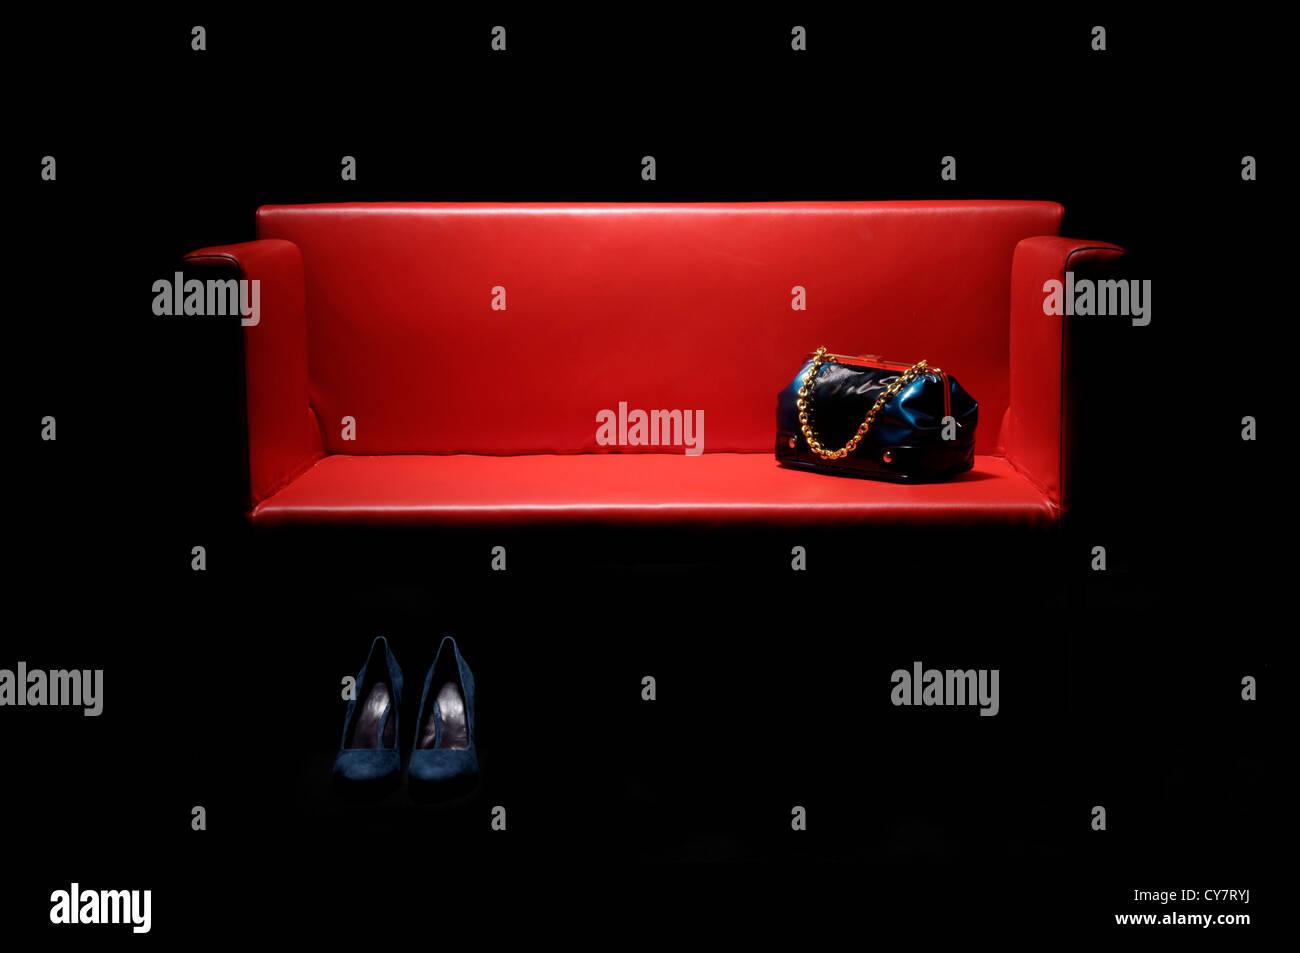 red sofa stockfotos red sofa bilder alamy. Black Bedroom Furniture Sets. Home Design Ideas